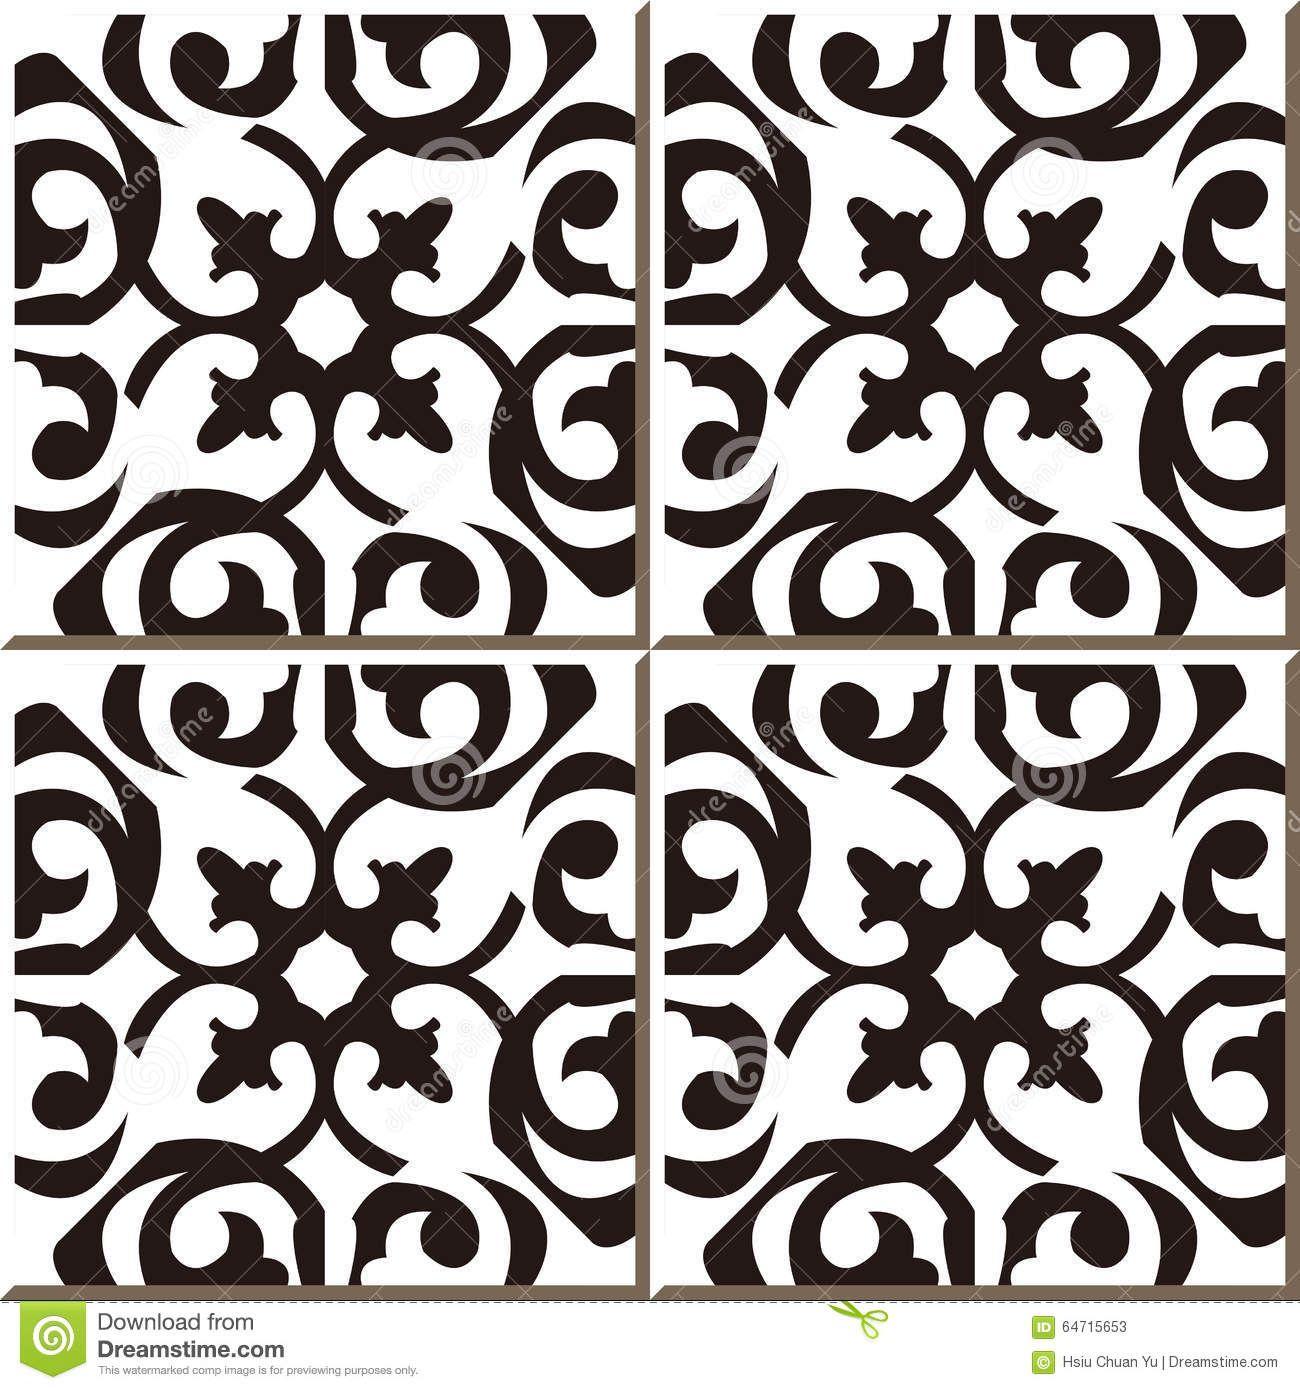 Image result for moroccan bathroom tiles black white | Bathroom ...